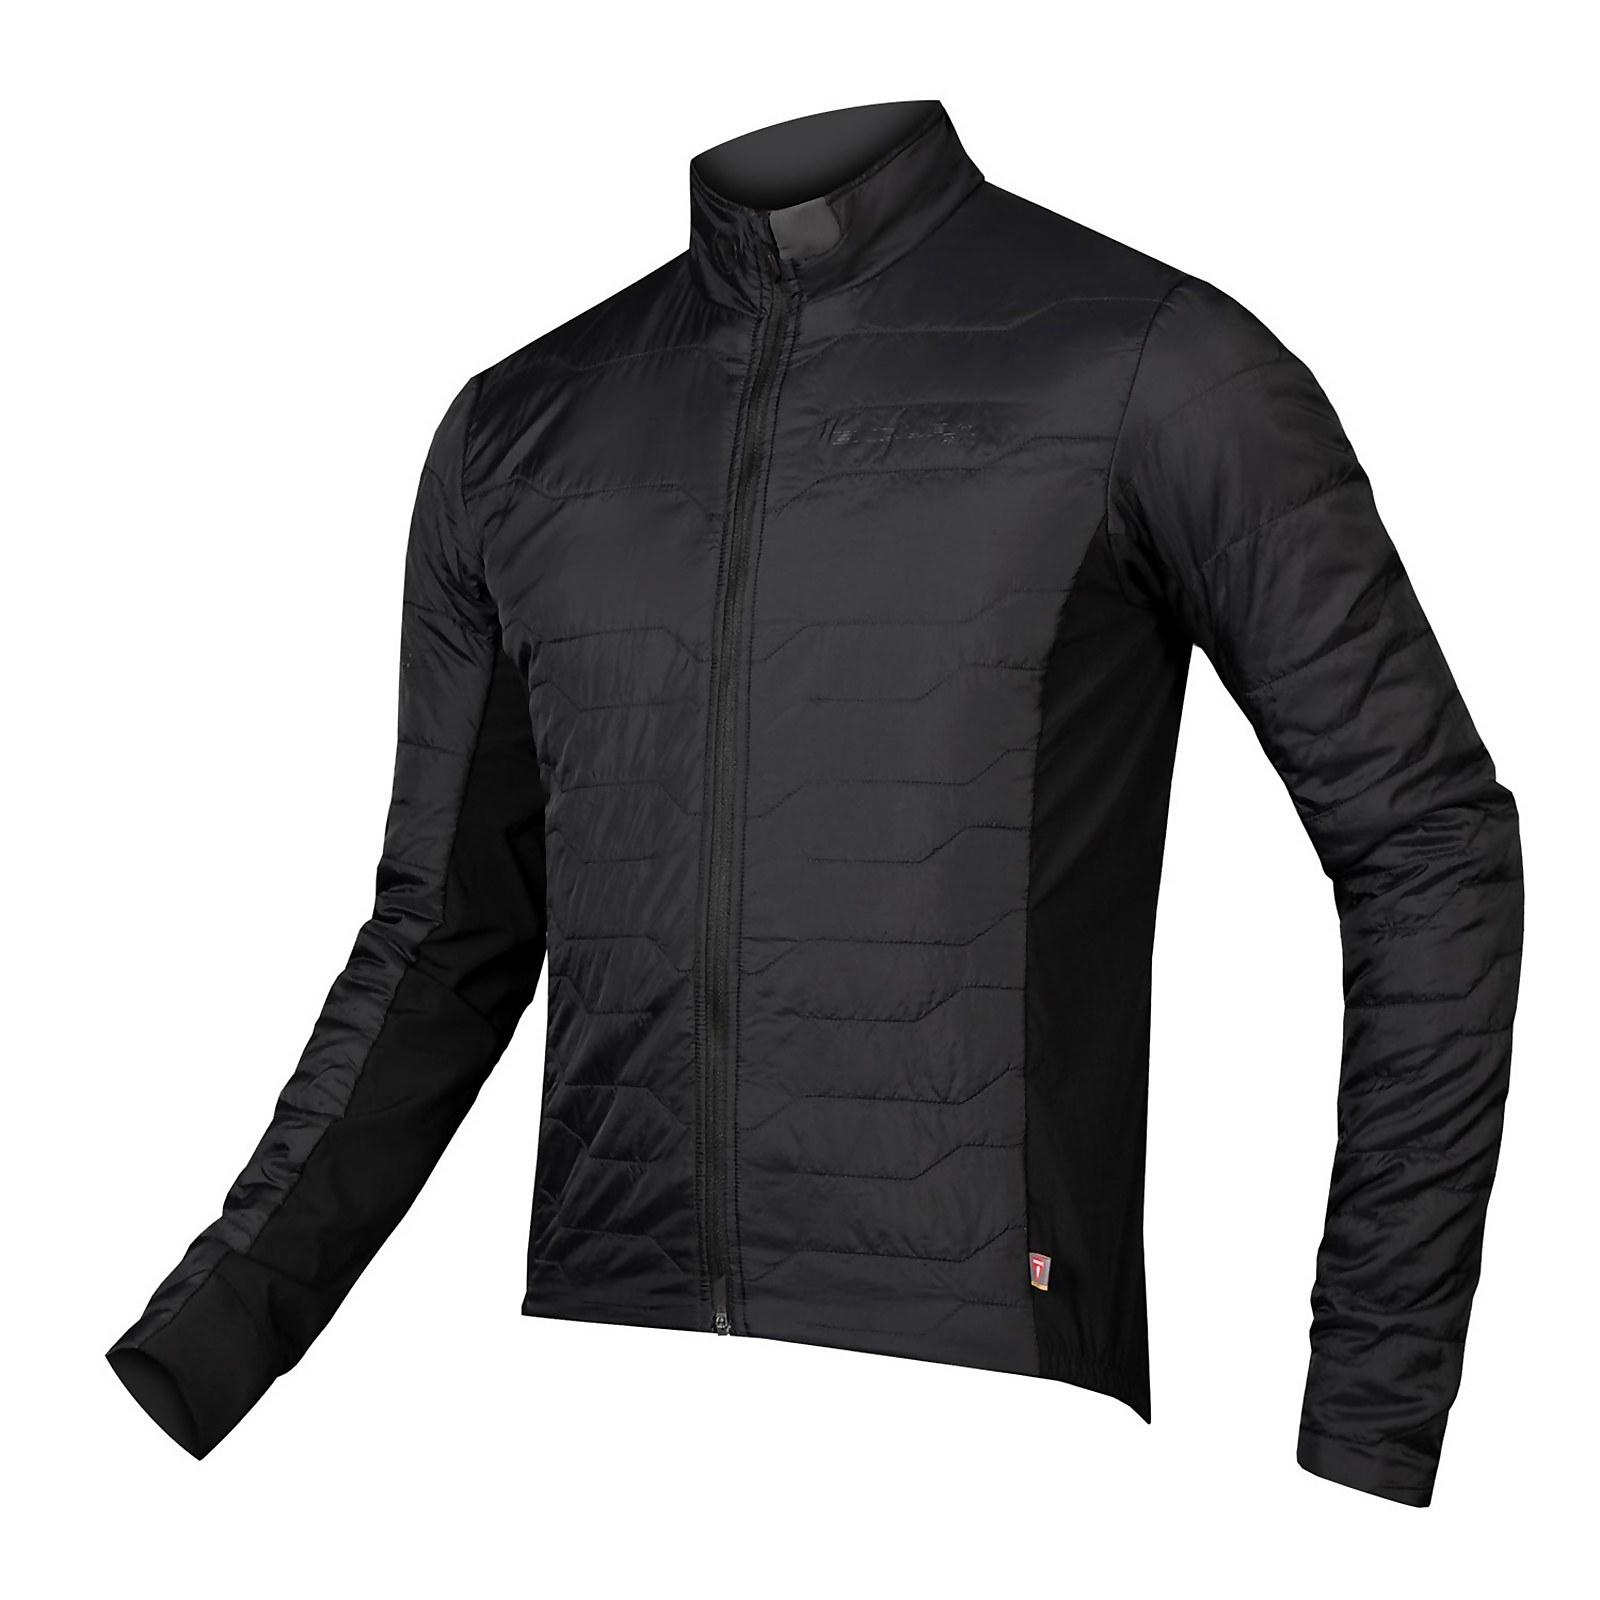 Pro Sl Primaloft Jacket Ii - Black - Xl